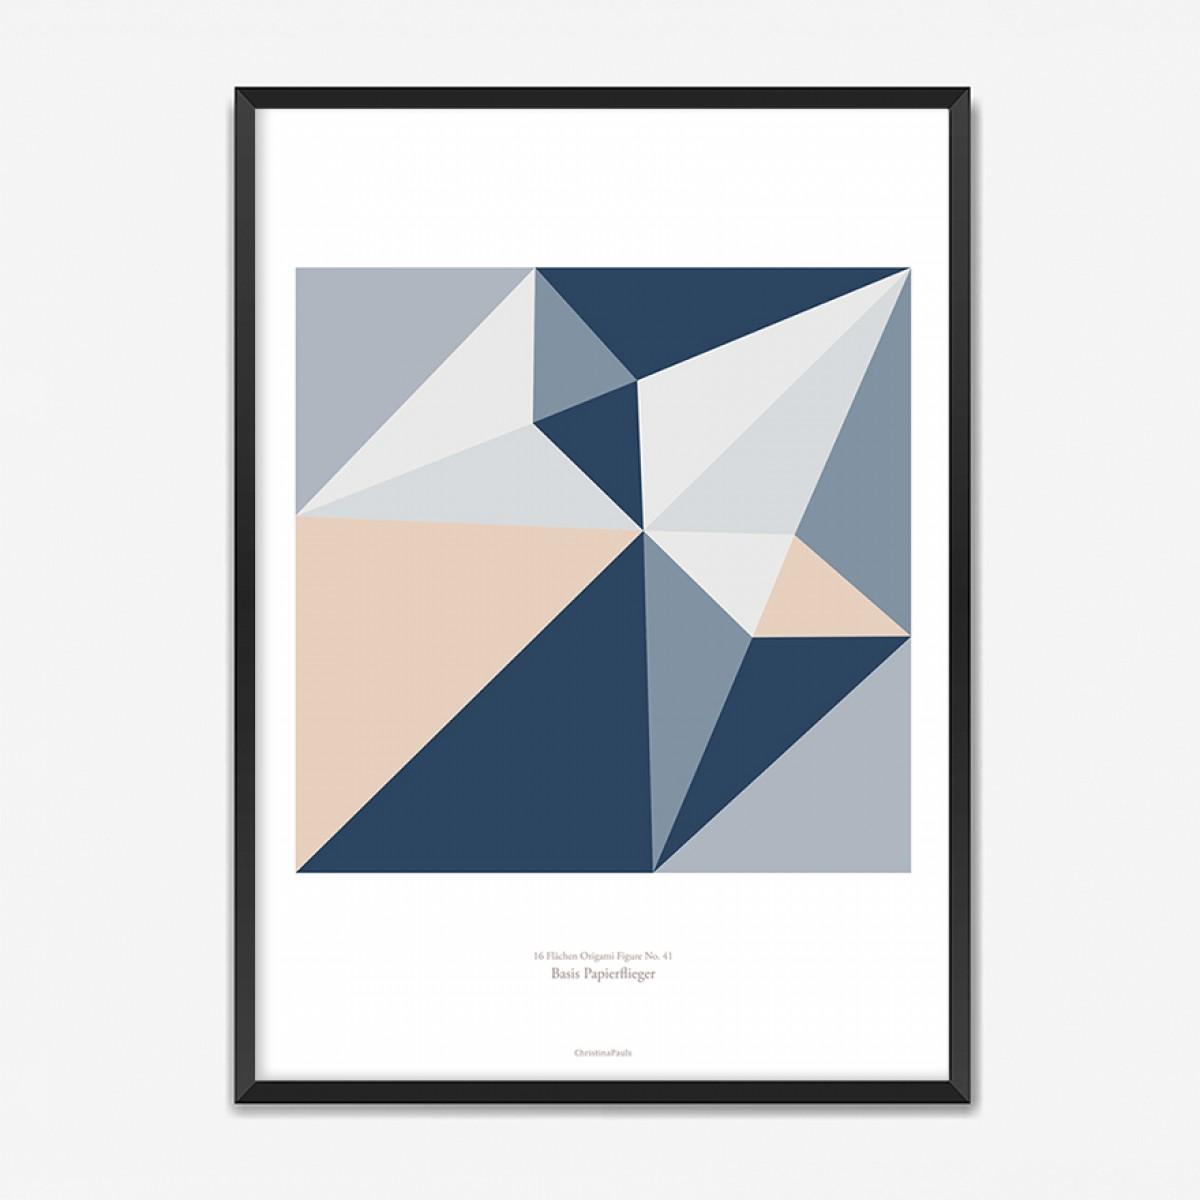 Origami Poster Papierdüsenflieger, mehrfarbig